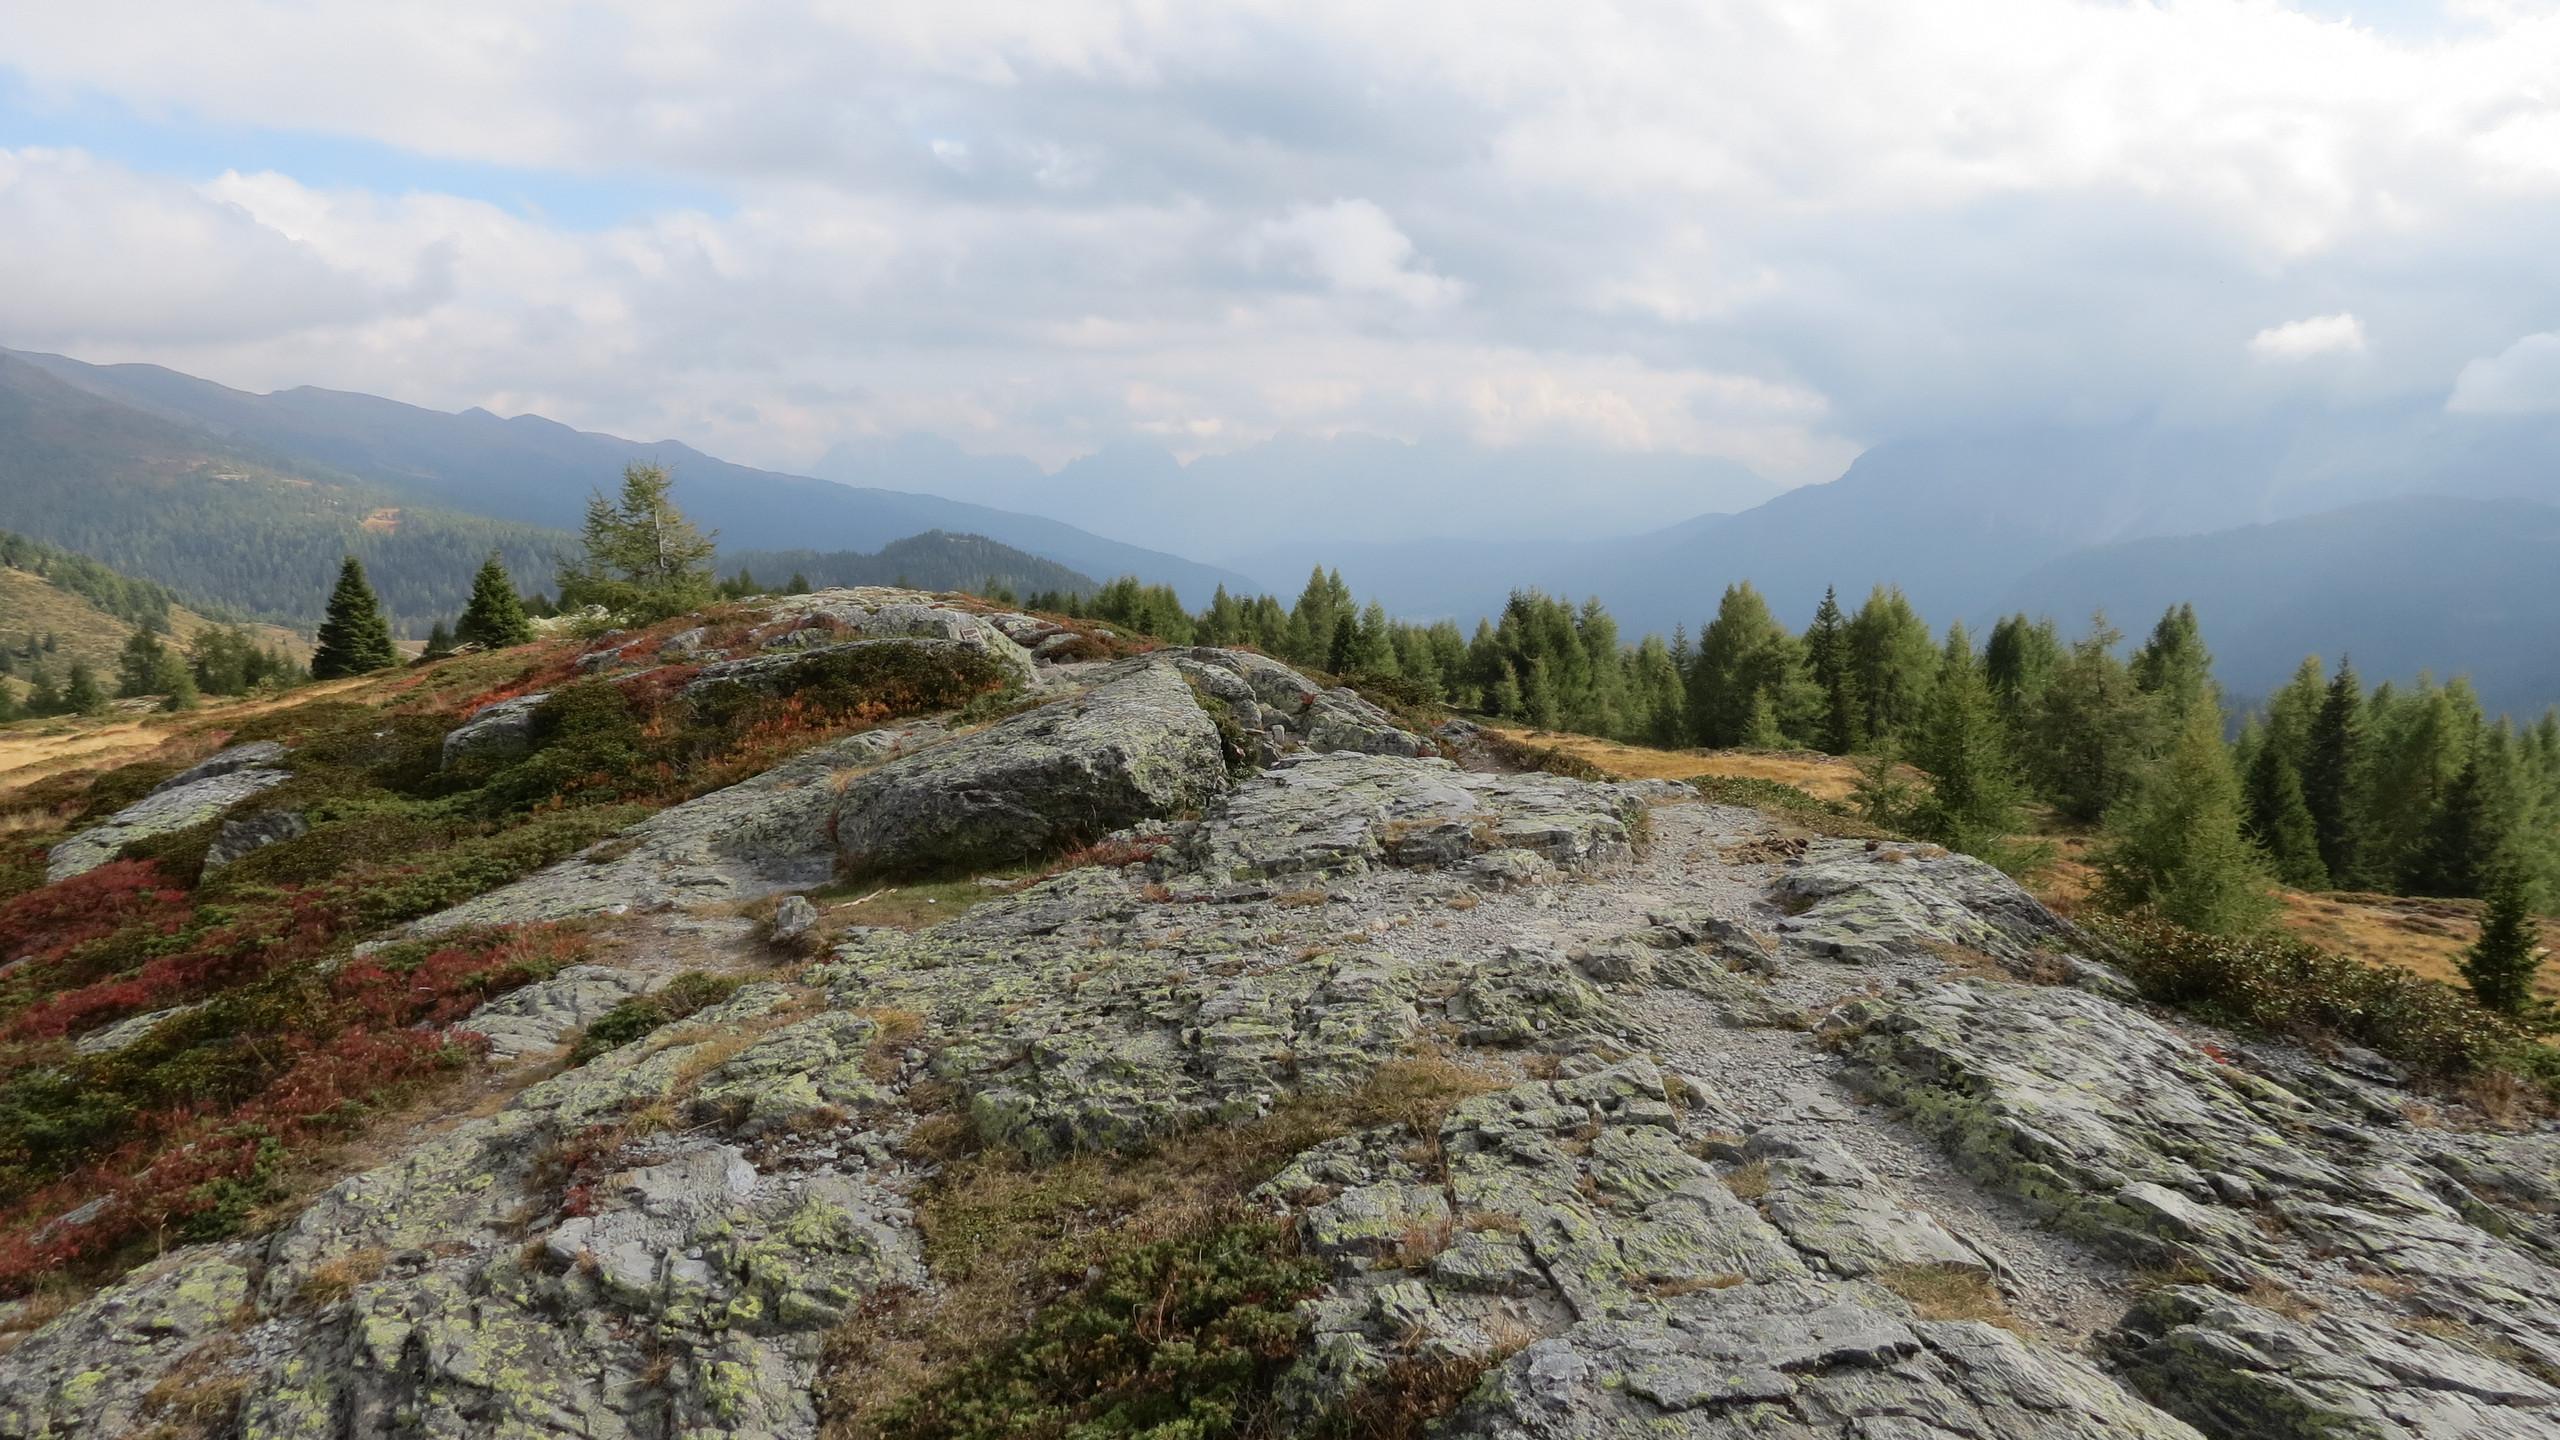 Rocks stretching on